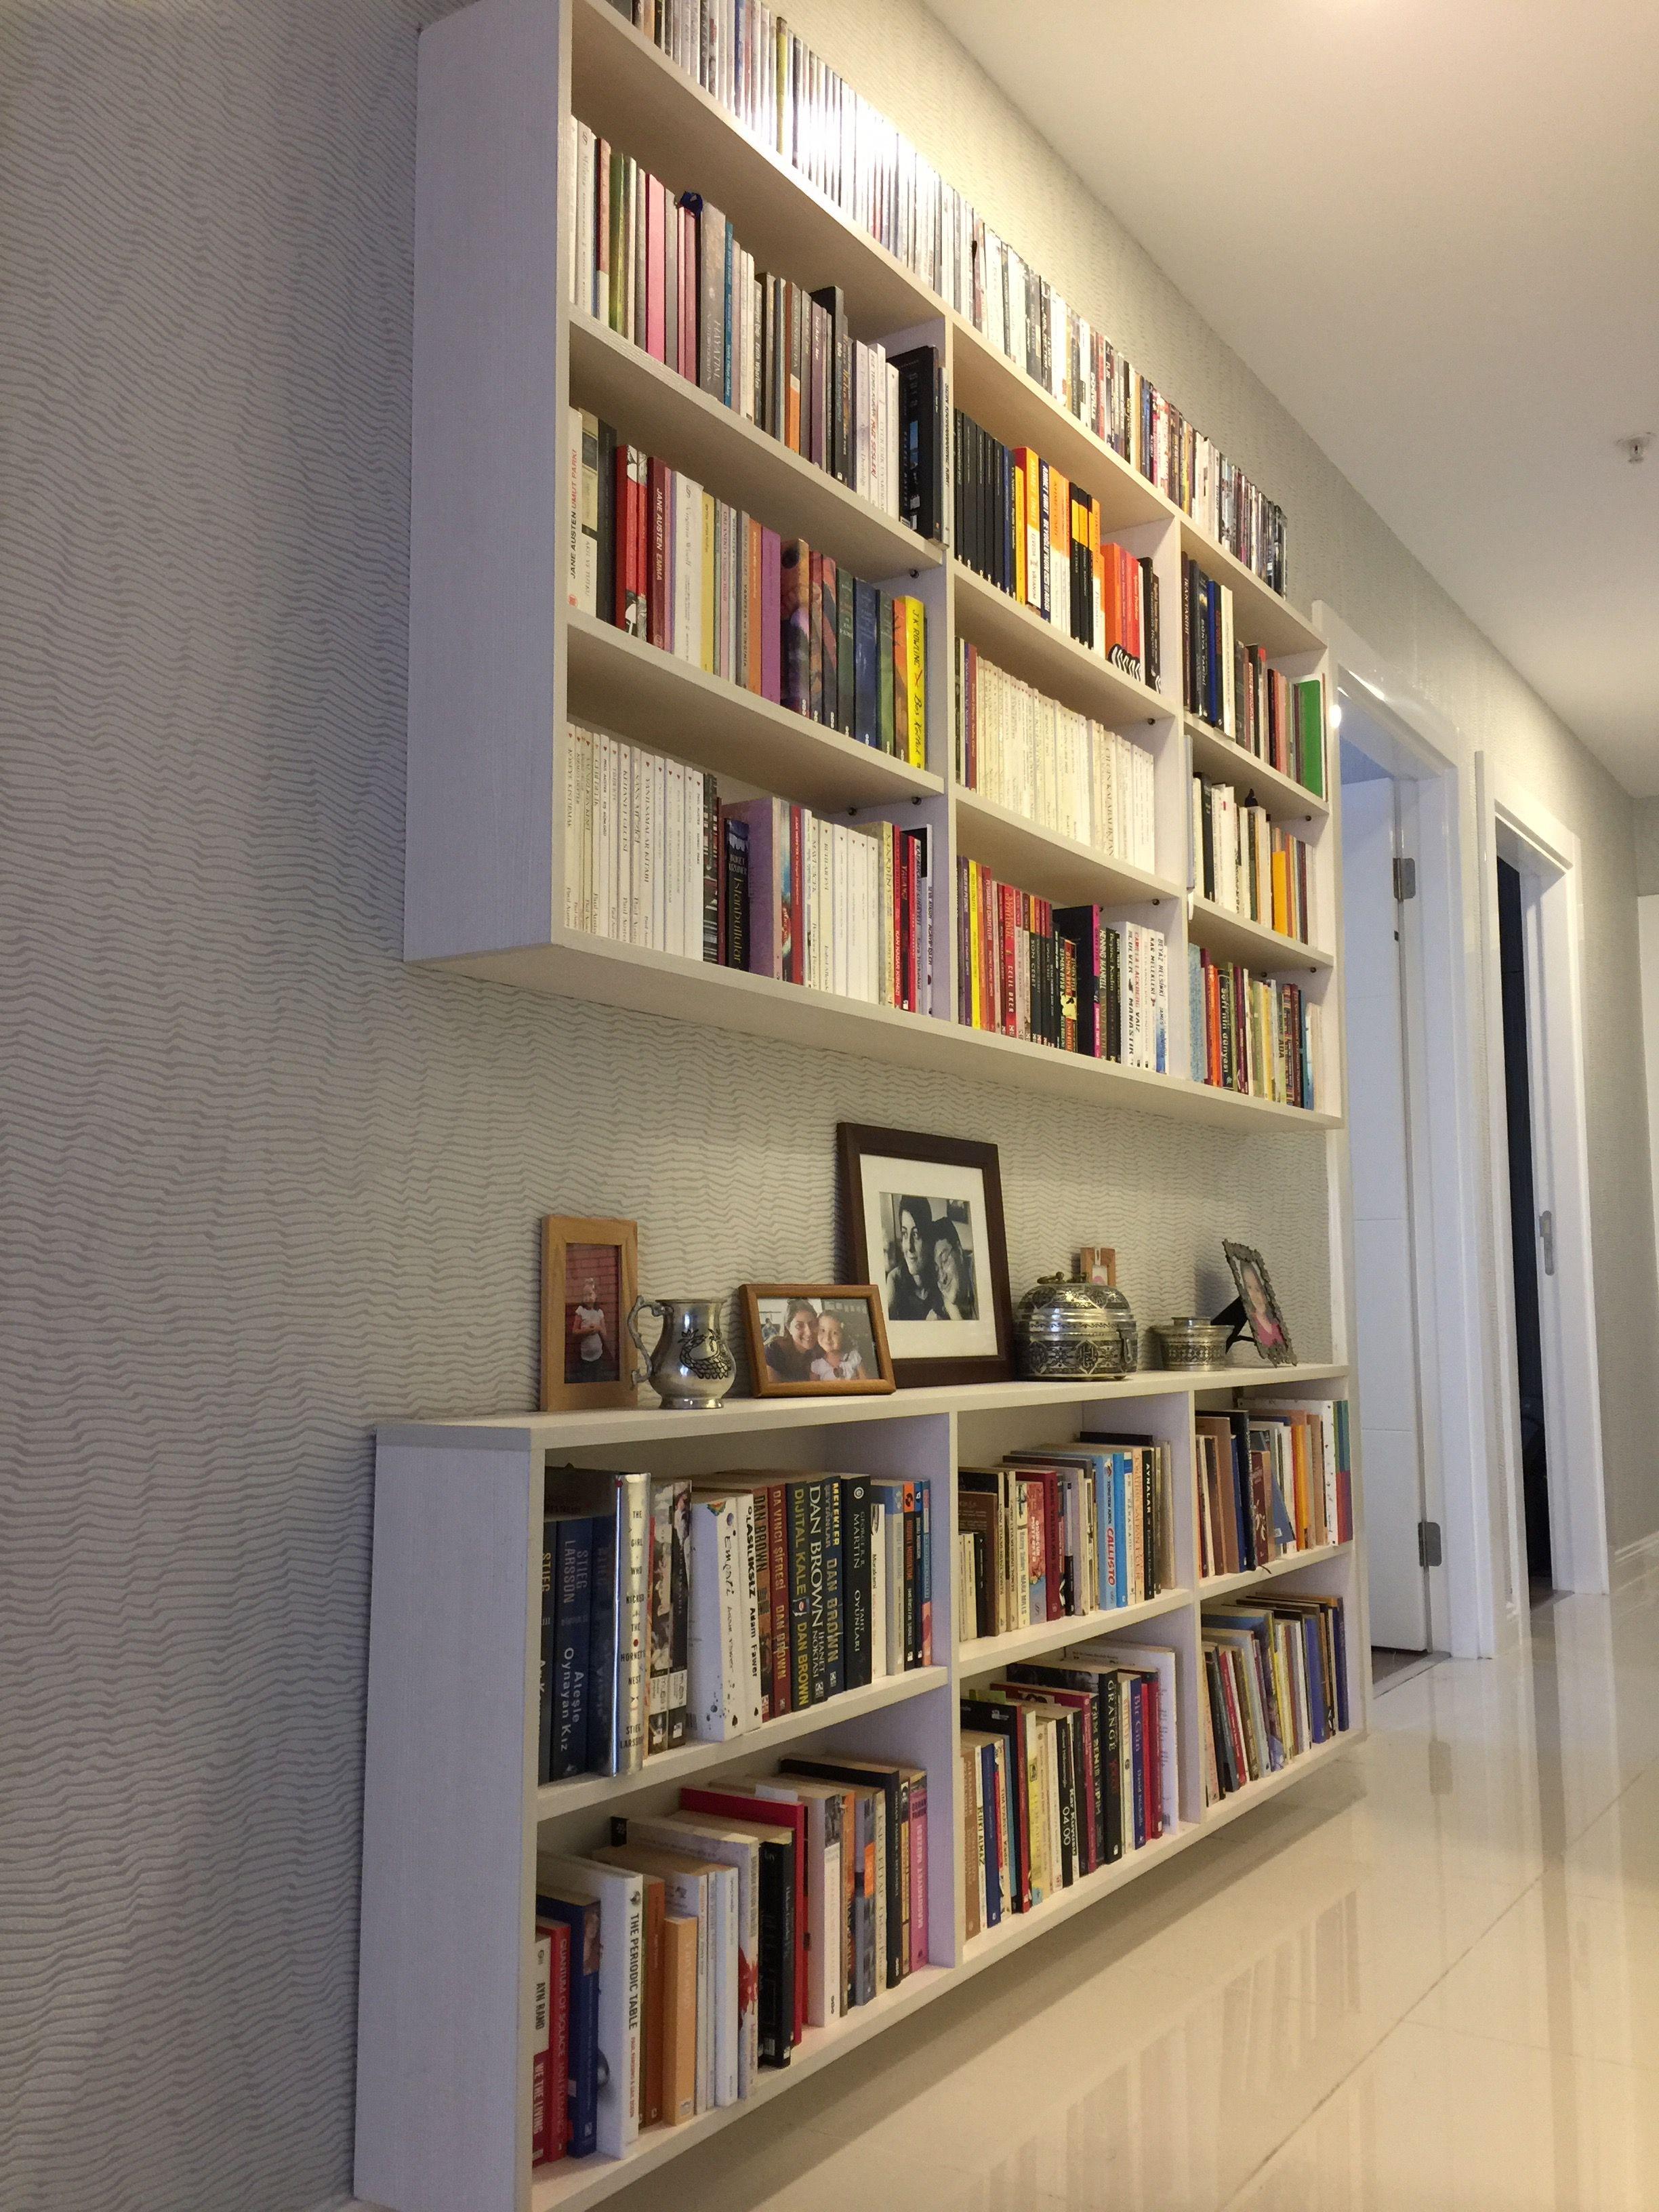 Efficient And Decorative Bookshelf Alternative For Narrow Spaces Dark Hallway Bookshelves Frosting